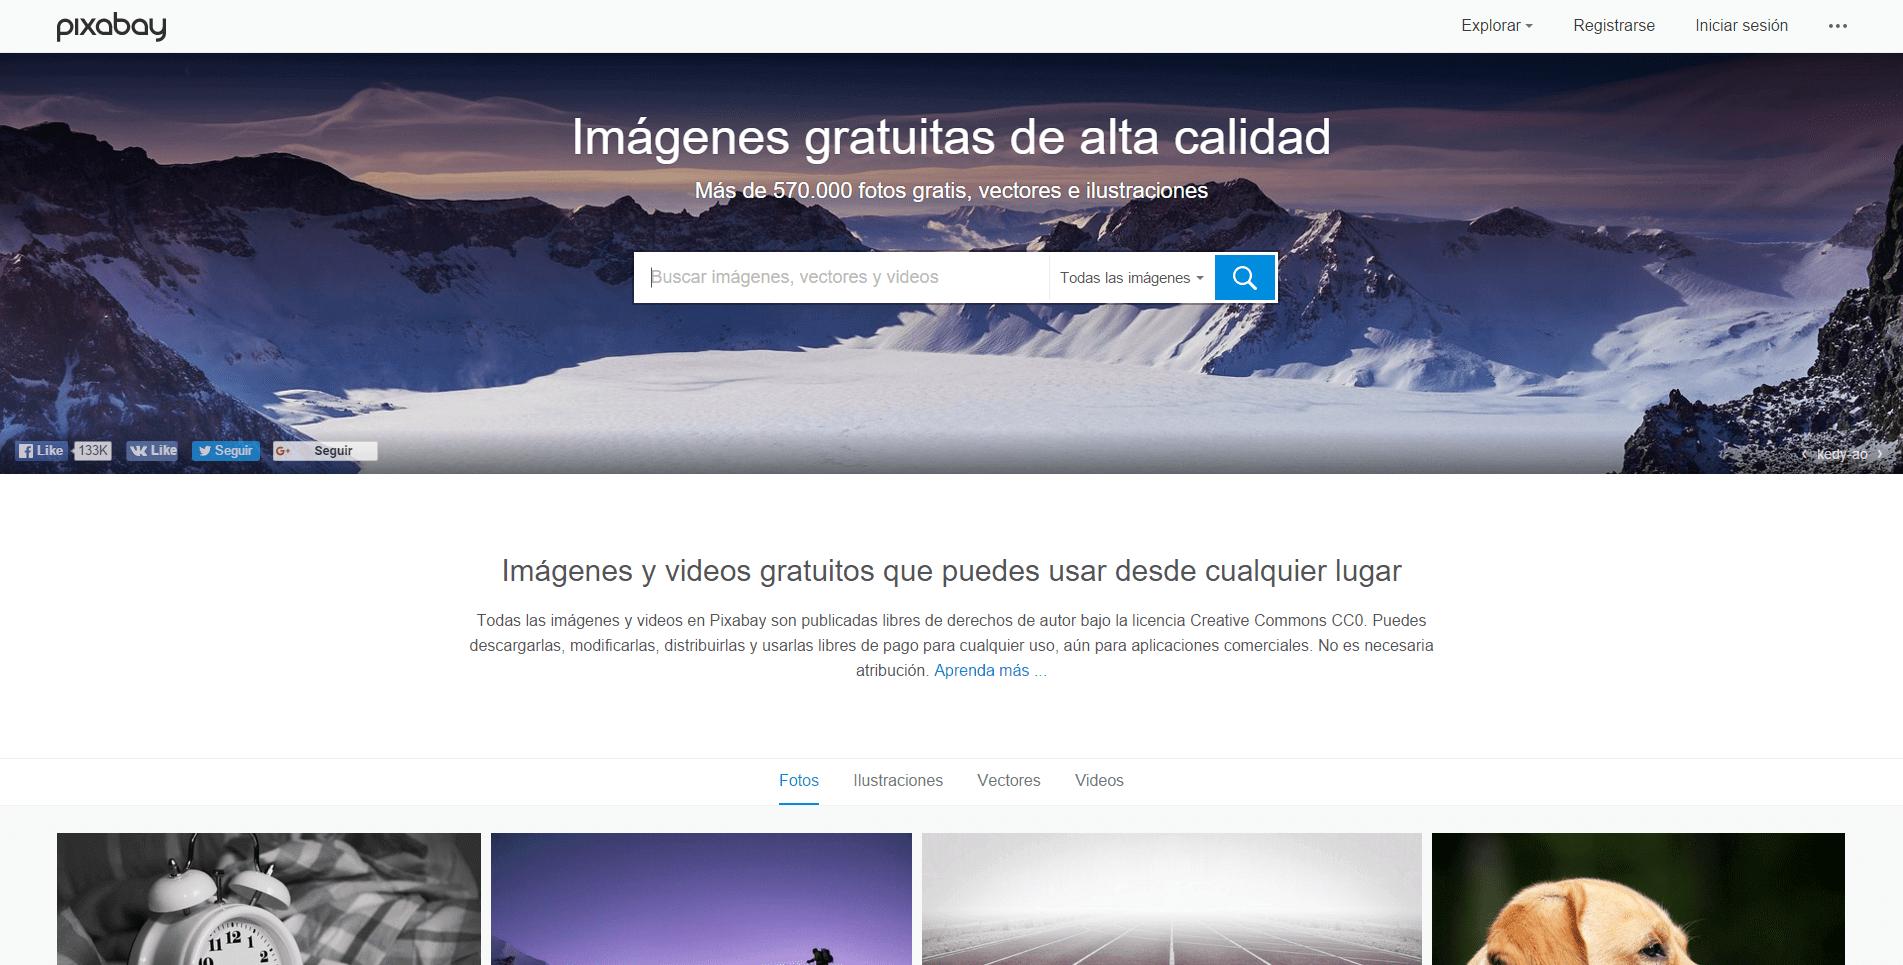 Imágenes gratis - Pixabay' - pixabay_com_es